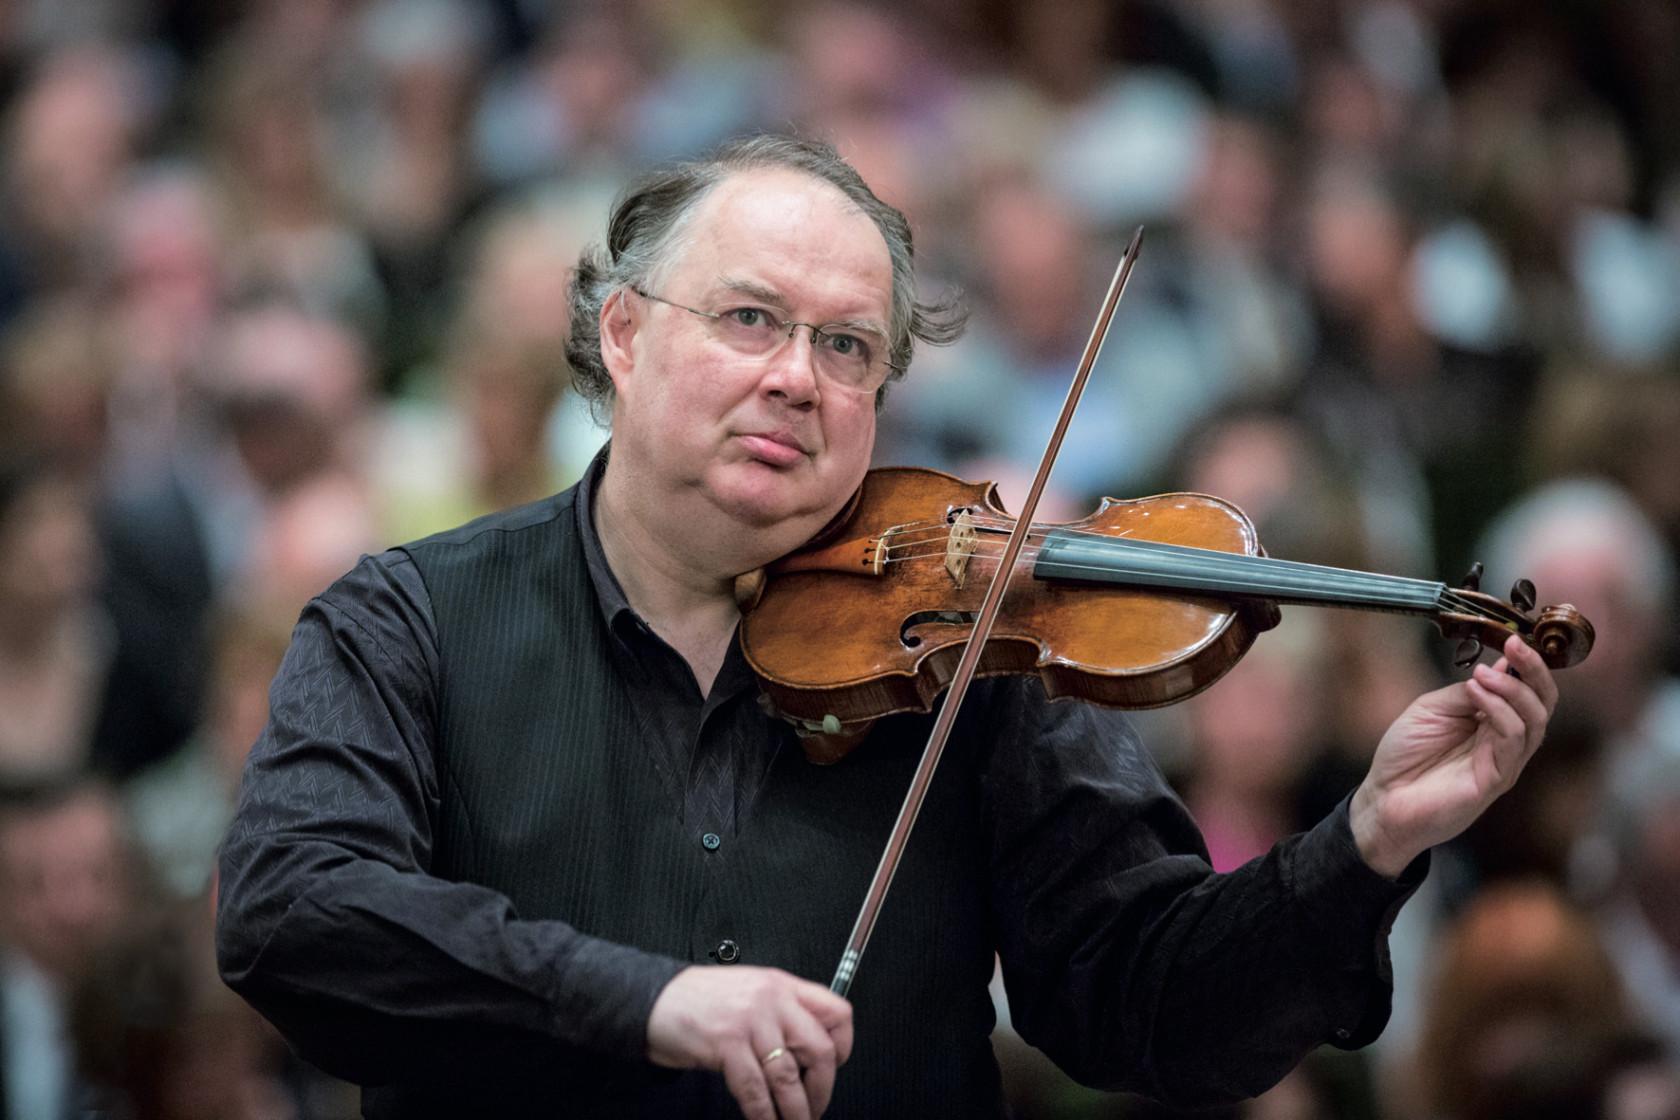 Erich Höbarth